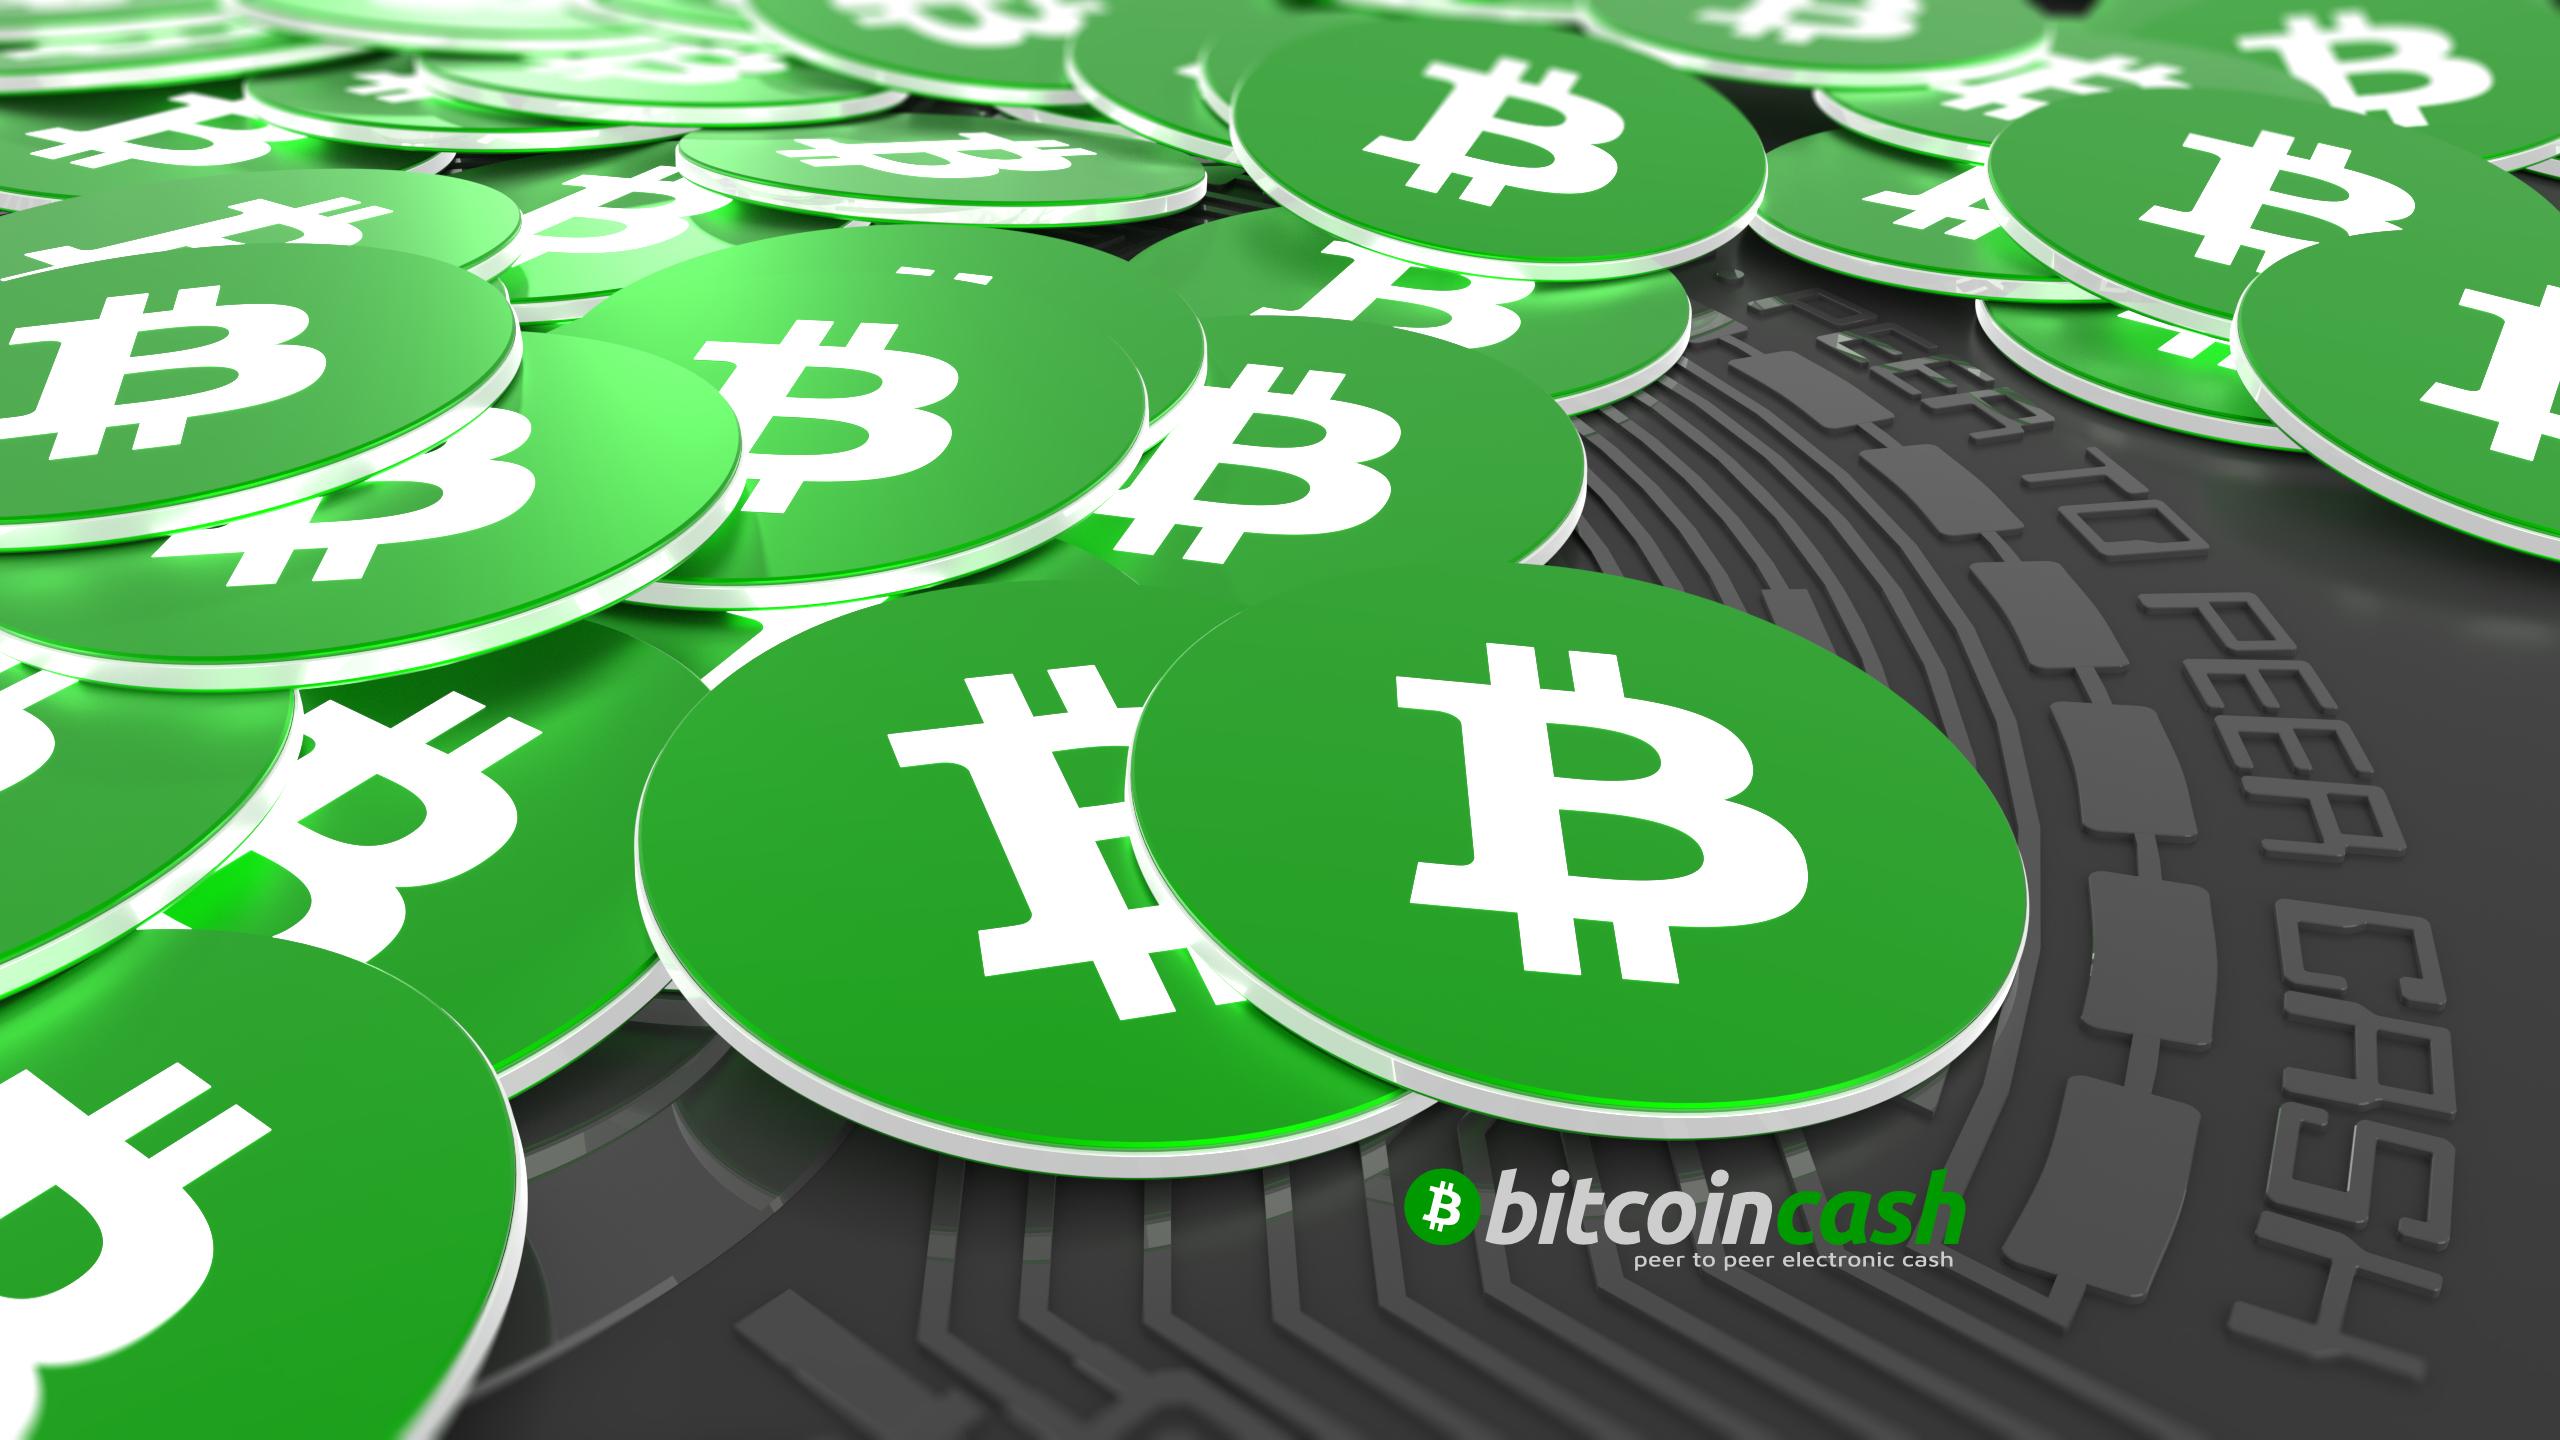 Bitcoin Cash(ビットコインキャッシュ) 高騰 理由